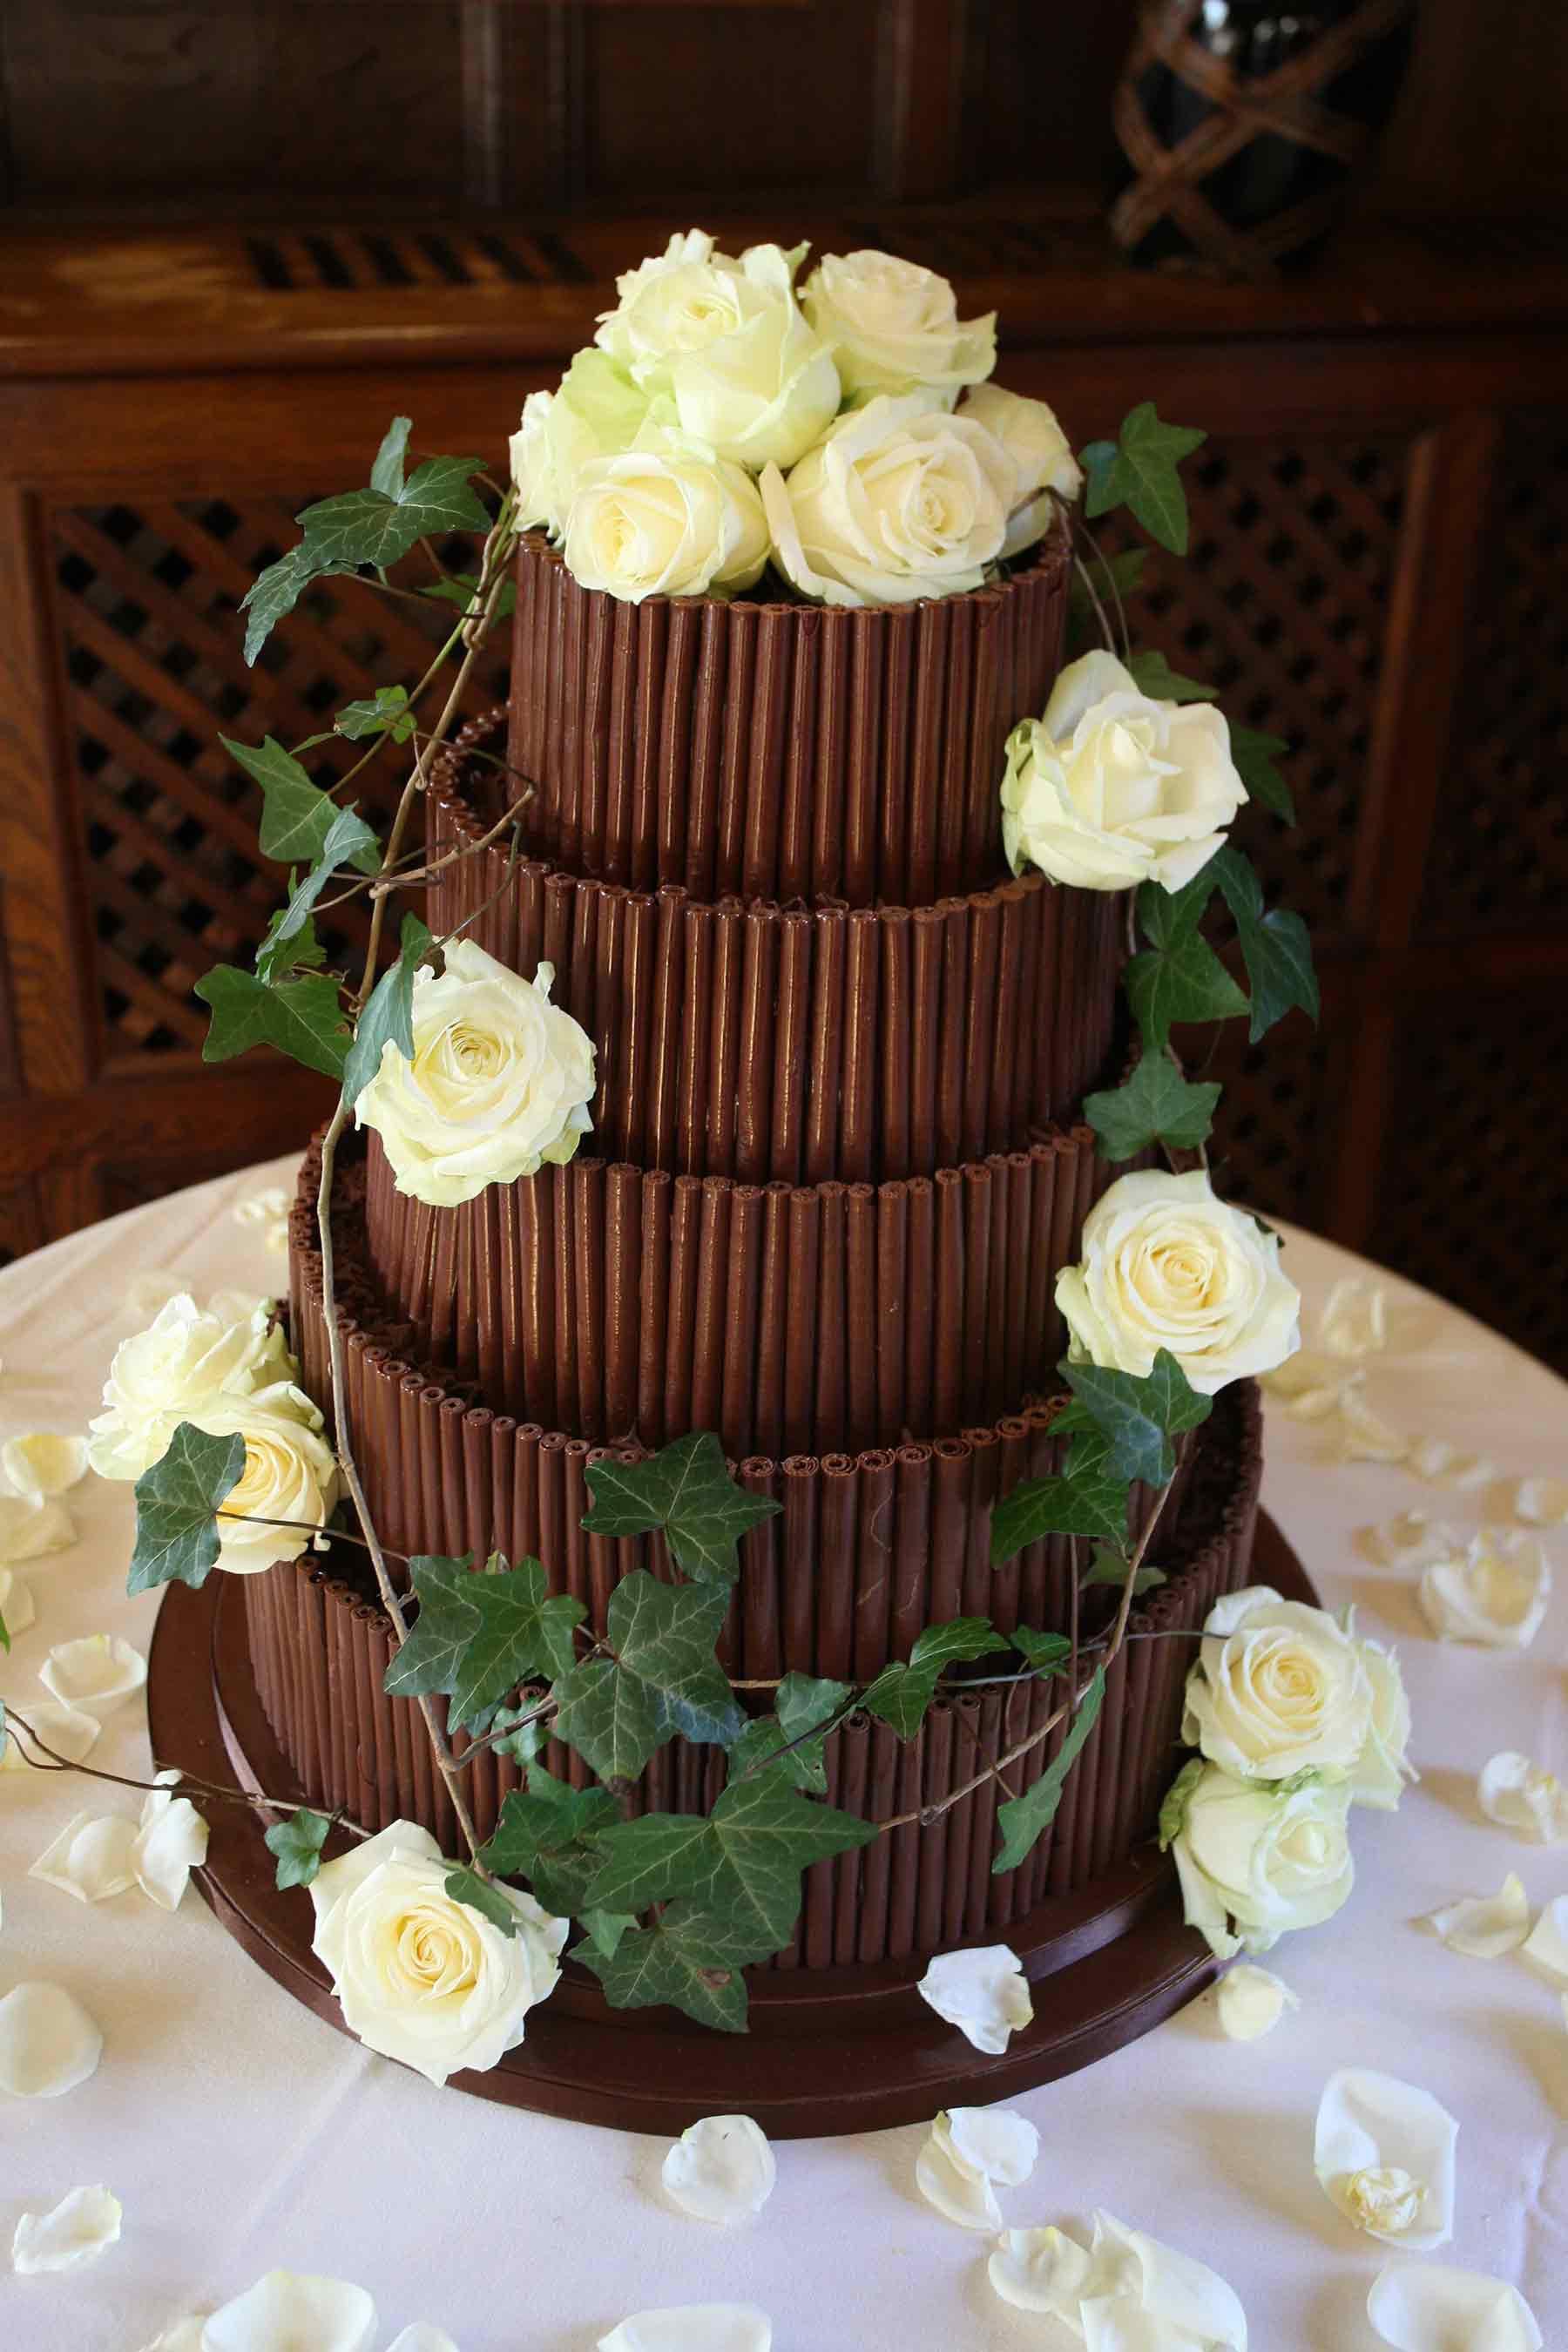 Wedding Cakes Decor  Best Wedding Cake Designs for Your Inspiration Registaz